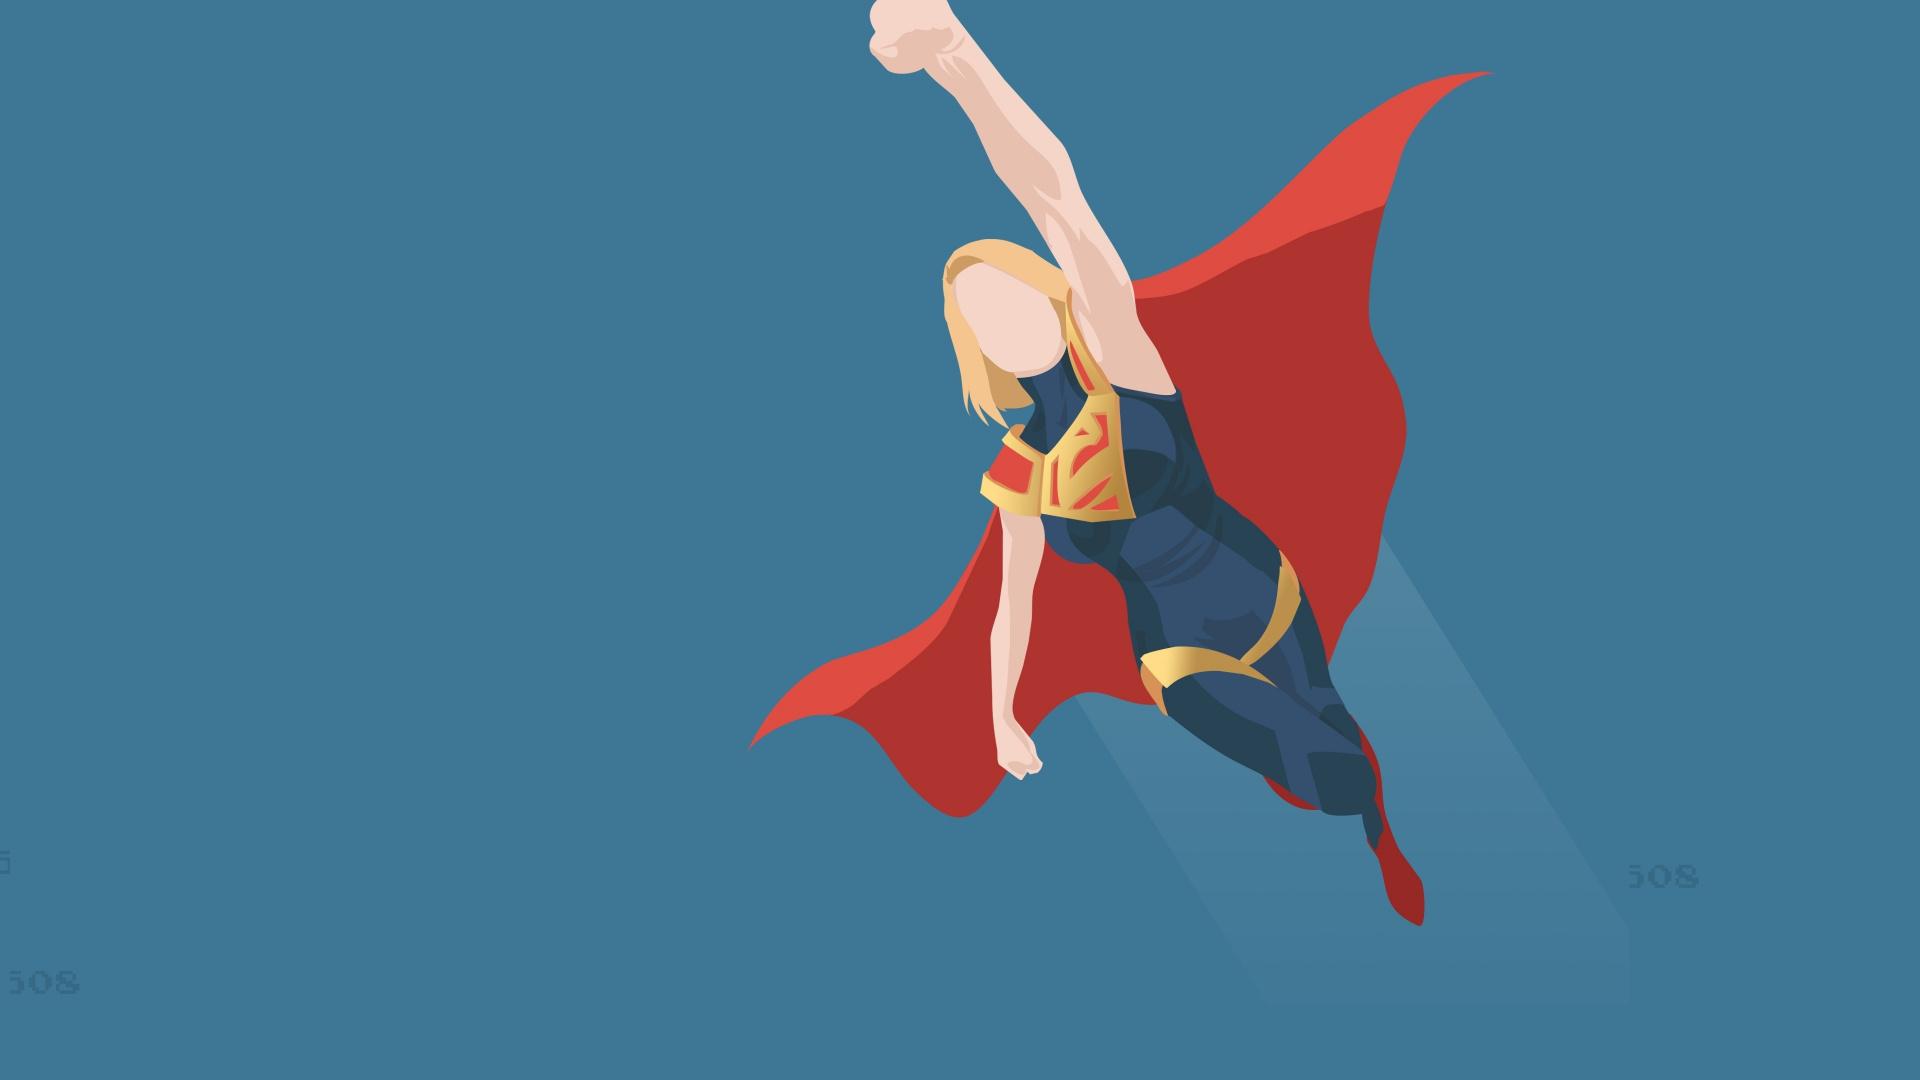 Supergirl, Injustice 2, Art, Wallpaper - Injustice 2 Artwork Supergirl - HD Wallpaper